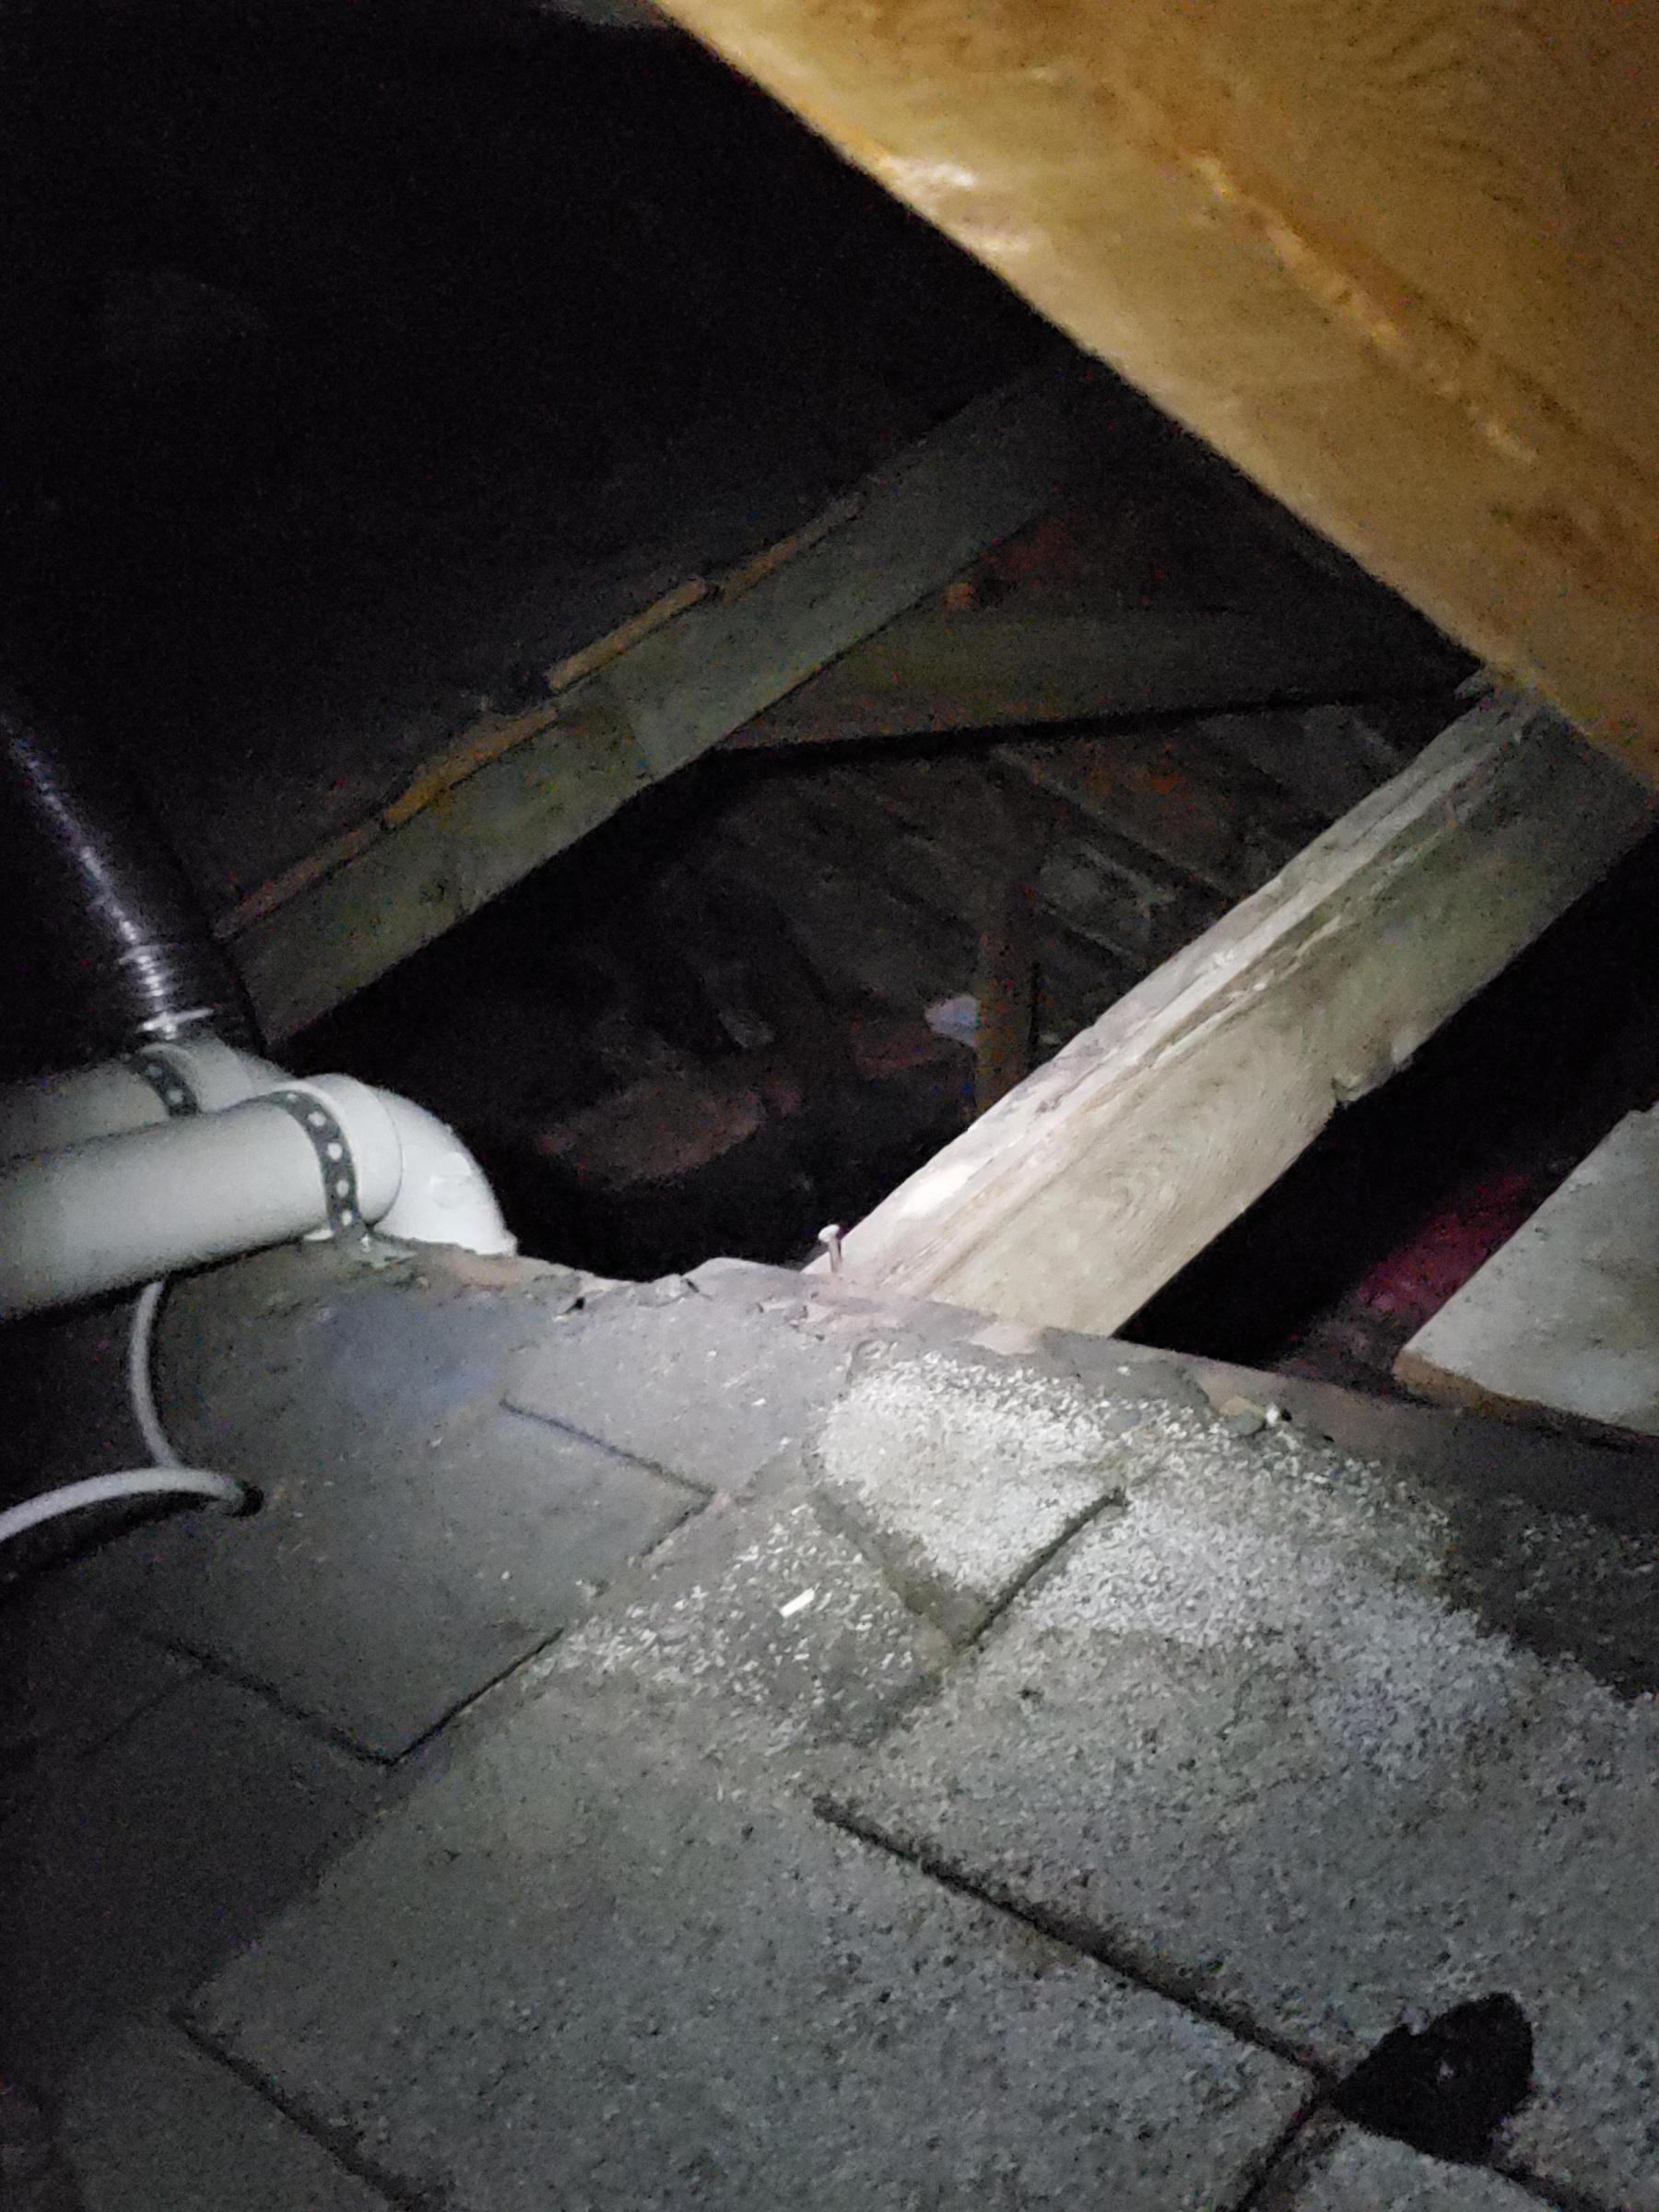 Insulation on no attic roof.-20190313_181331_1552601575037.jpg